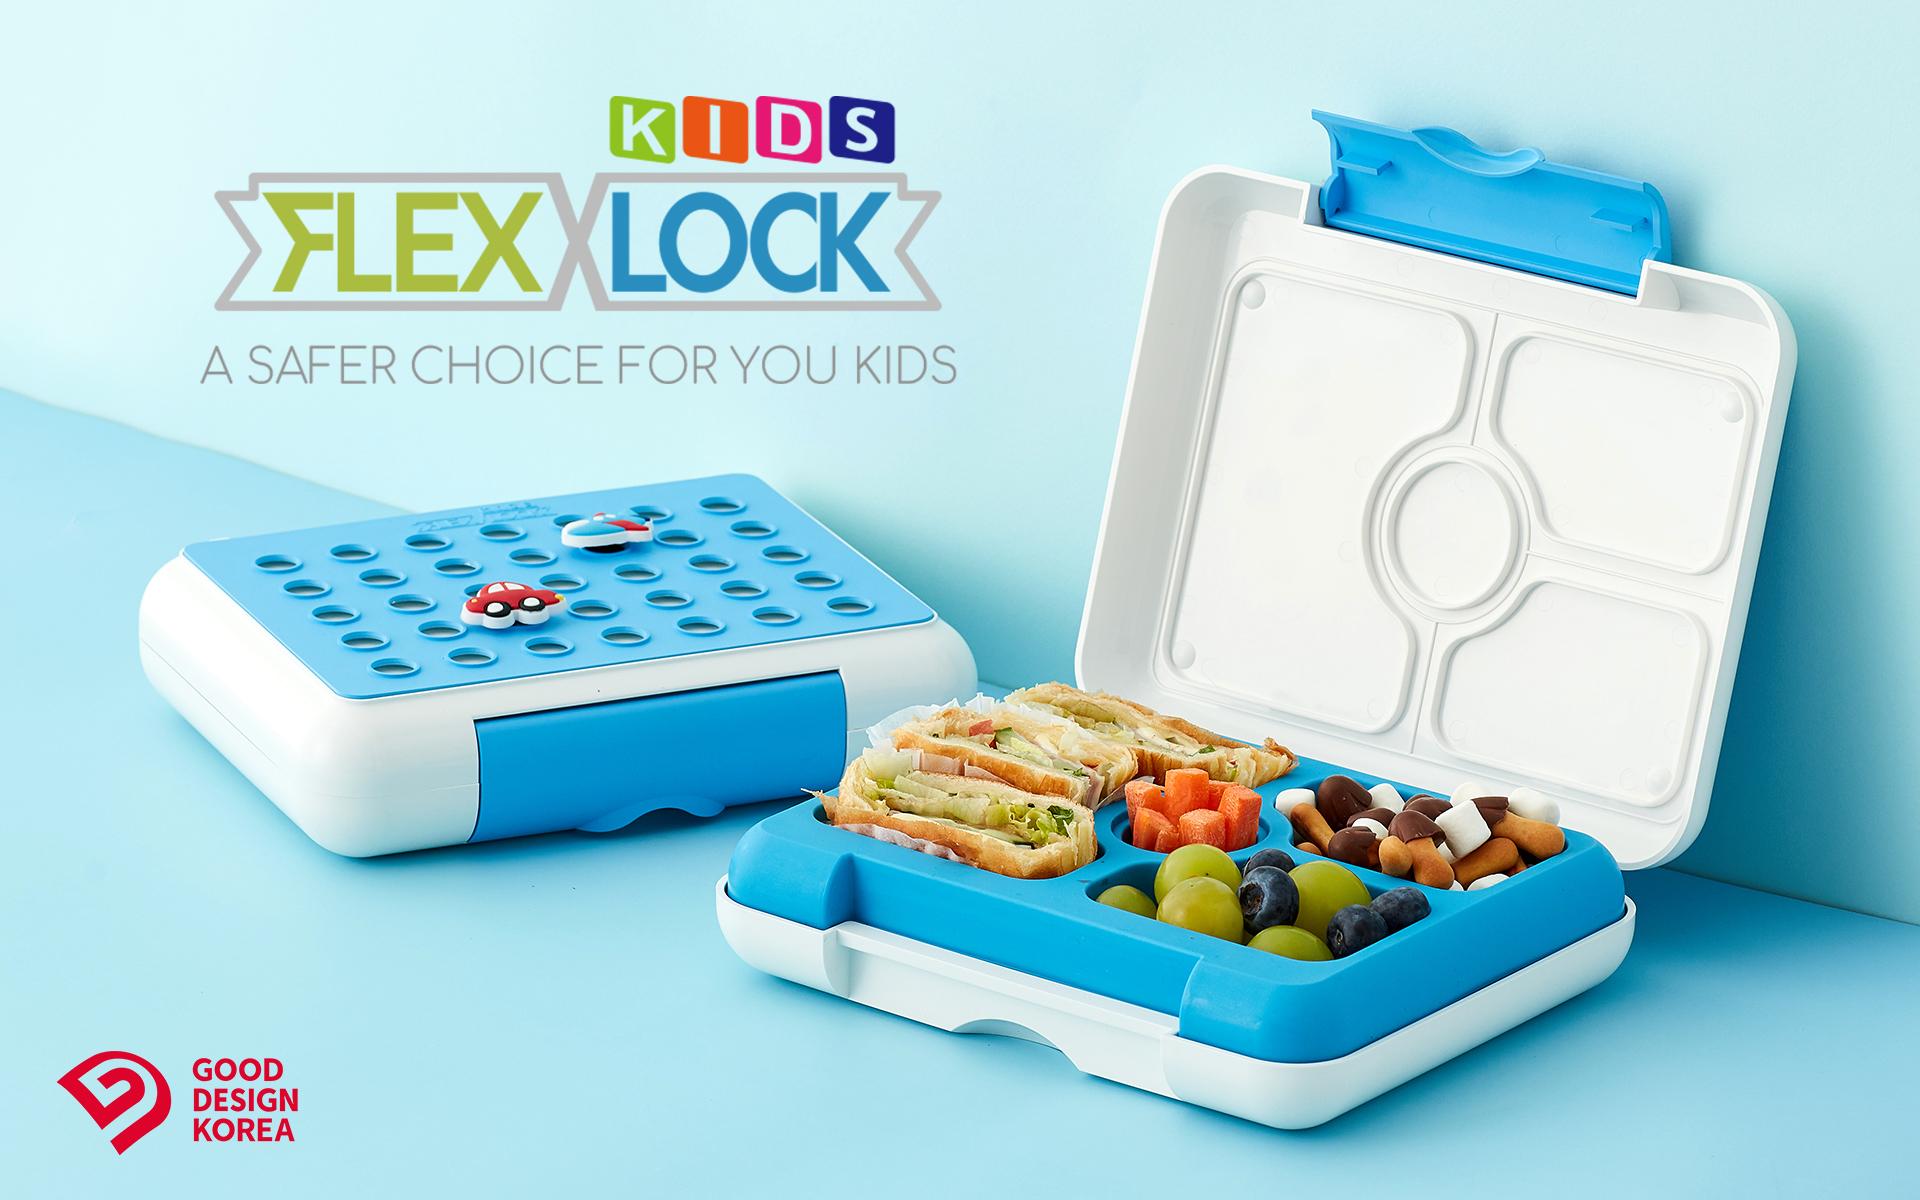 kids,bento,flexnlock,design